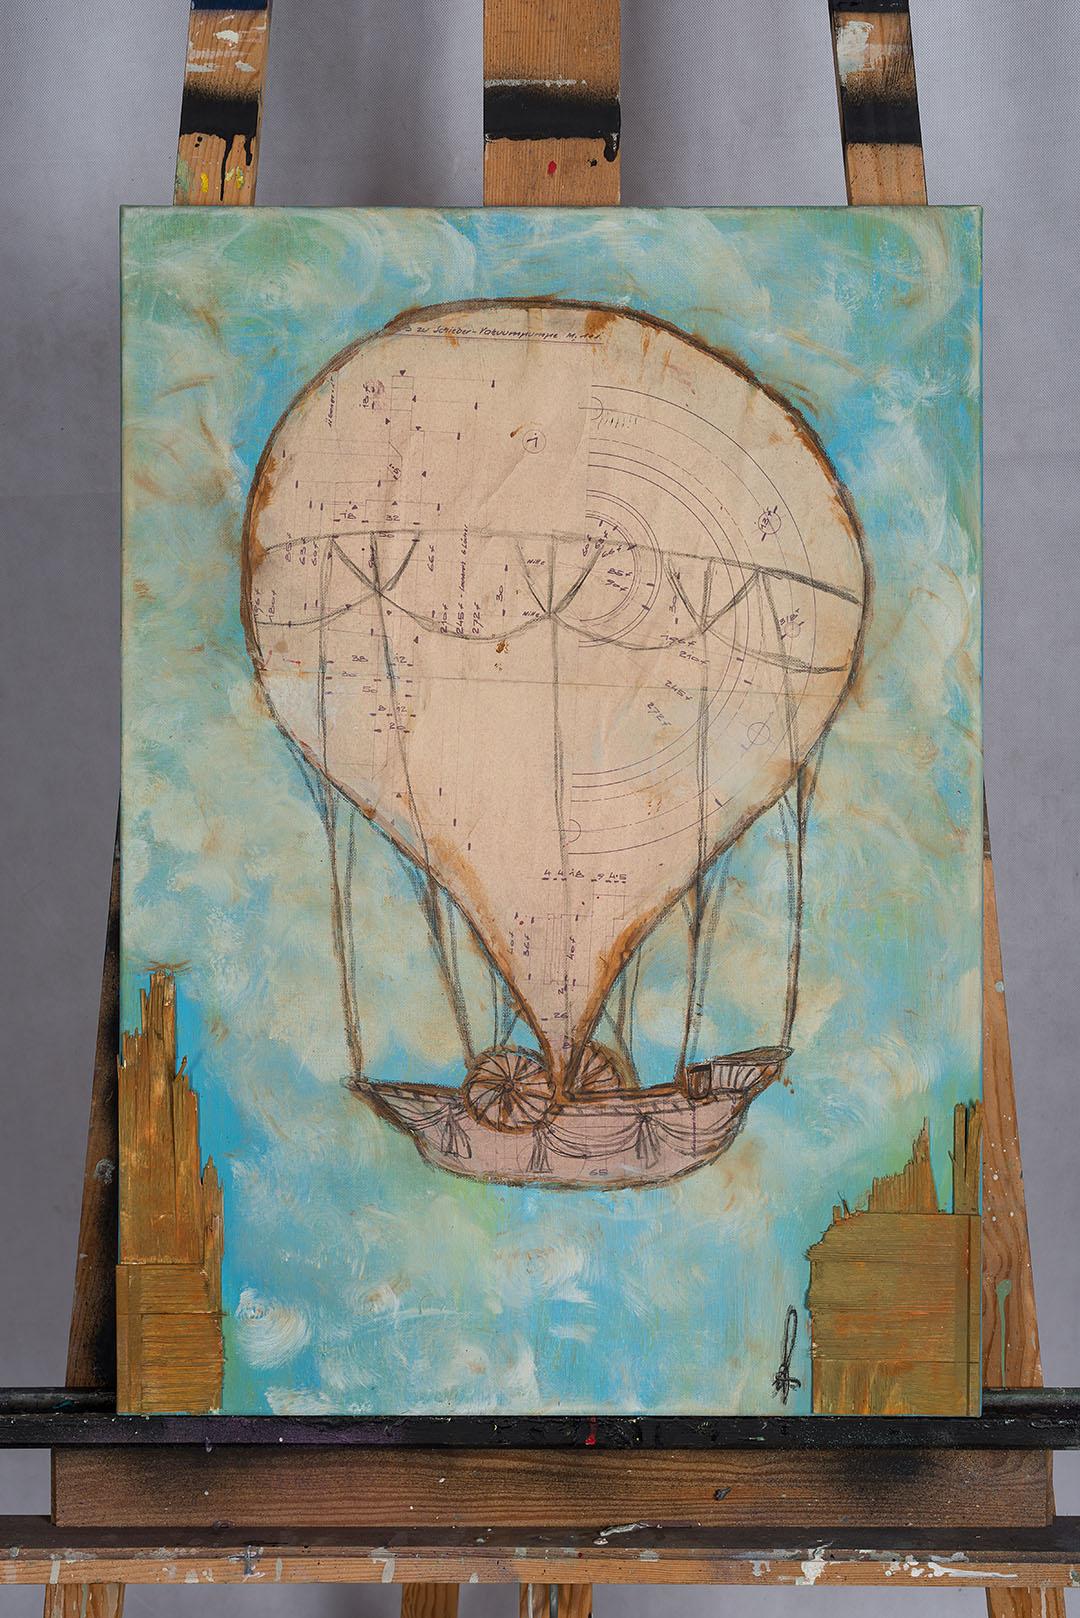 The old Balloon